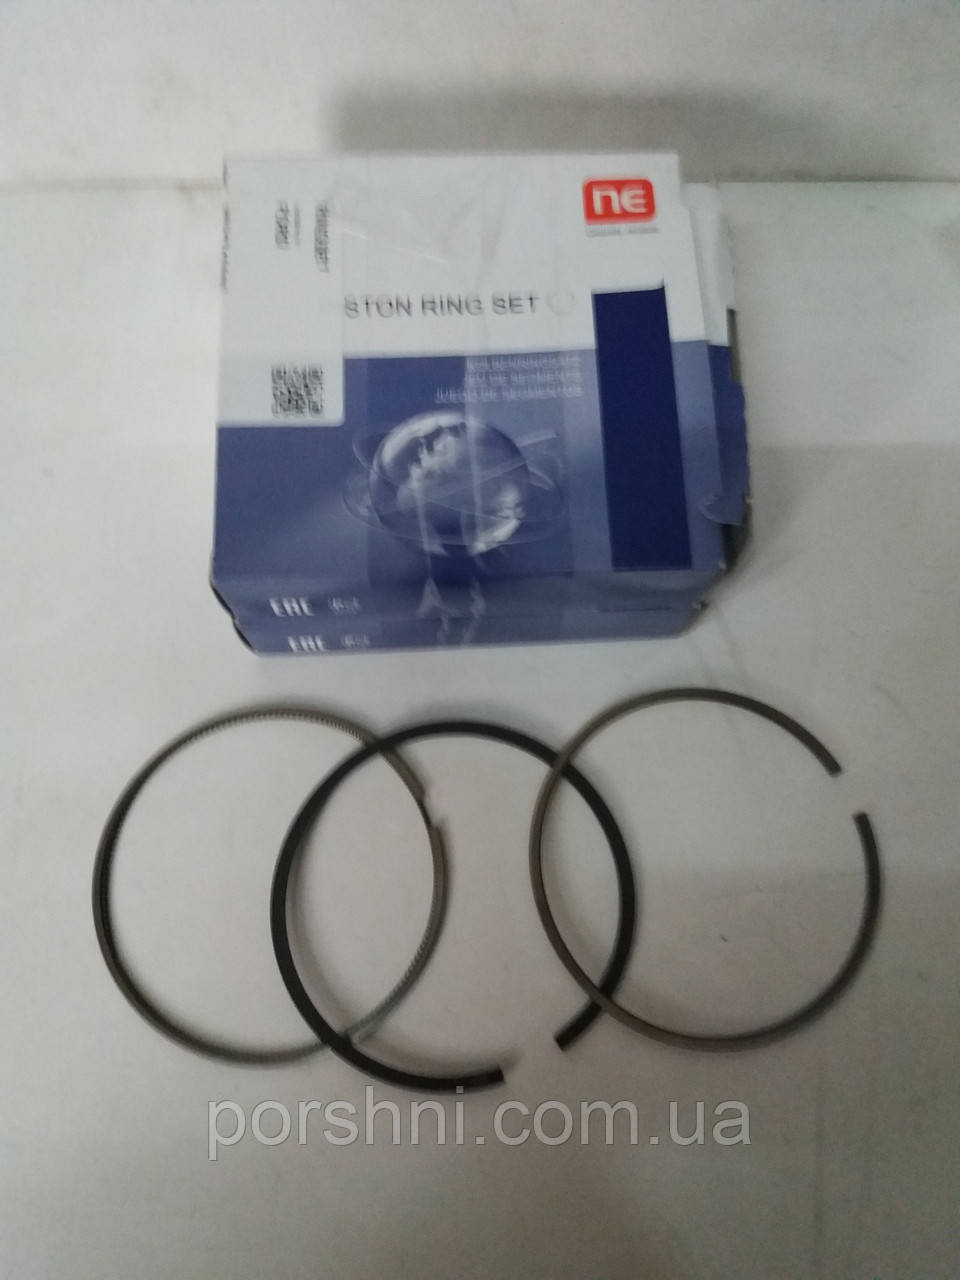 Кольца Форд Фокус Мондео  87,5 STD    ( 1,2 x 1.2 x 2 )  2,0  ECO  BOOST